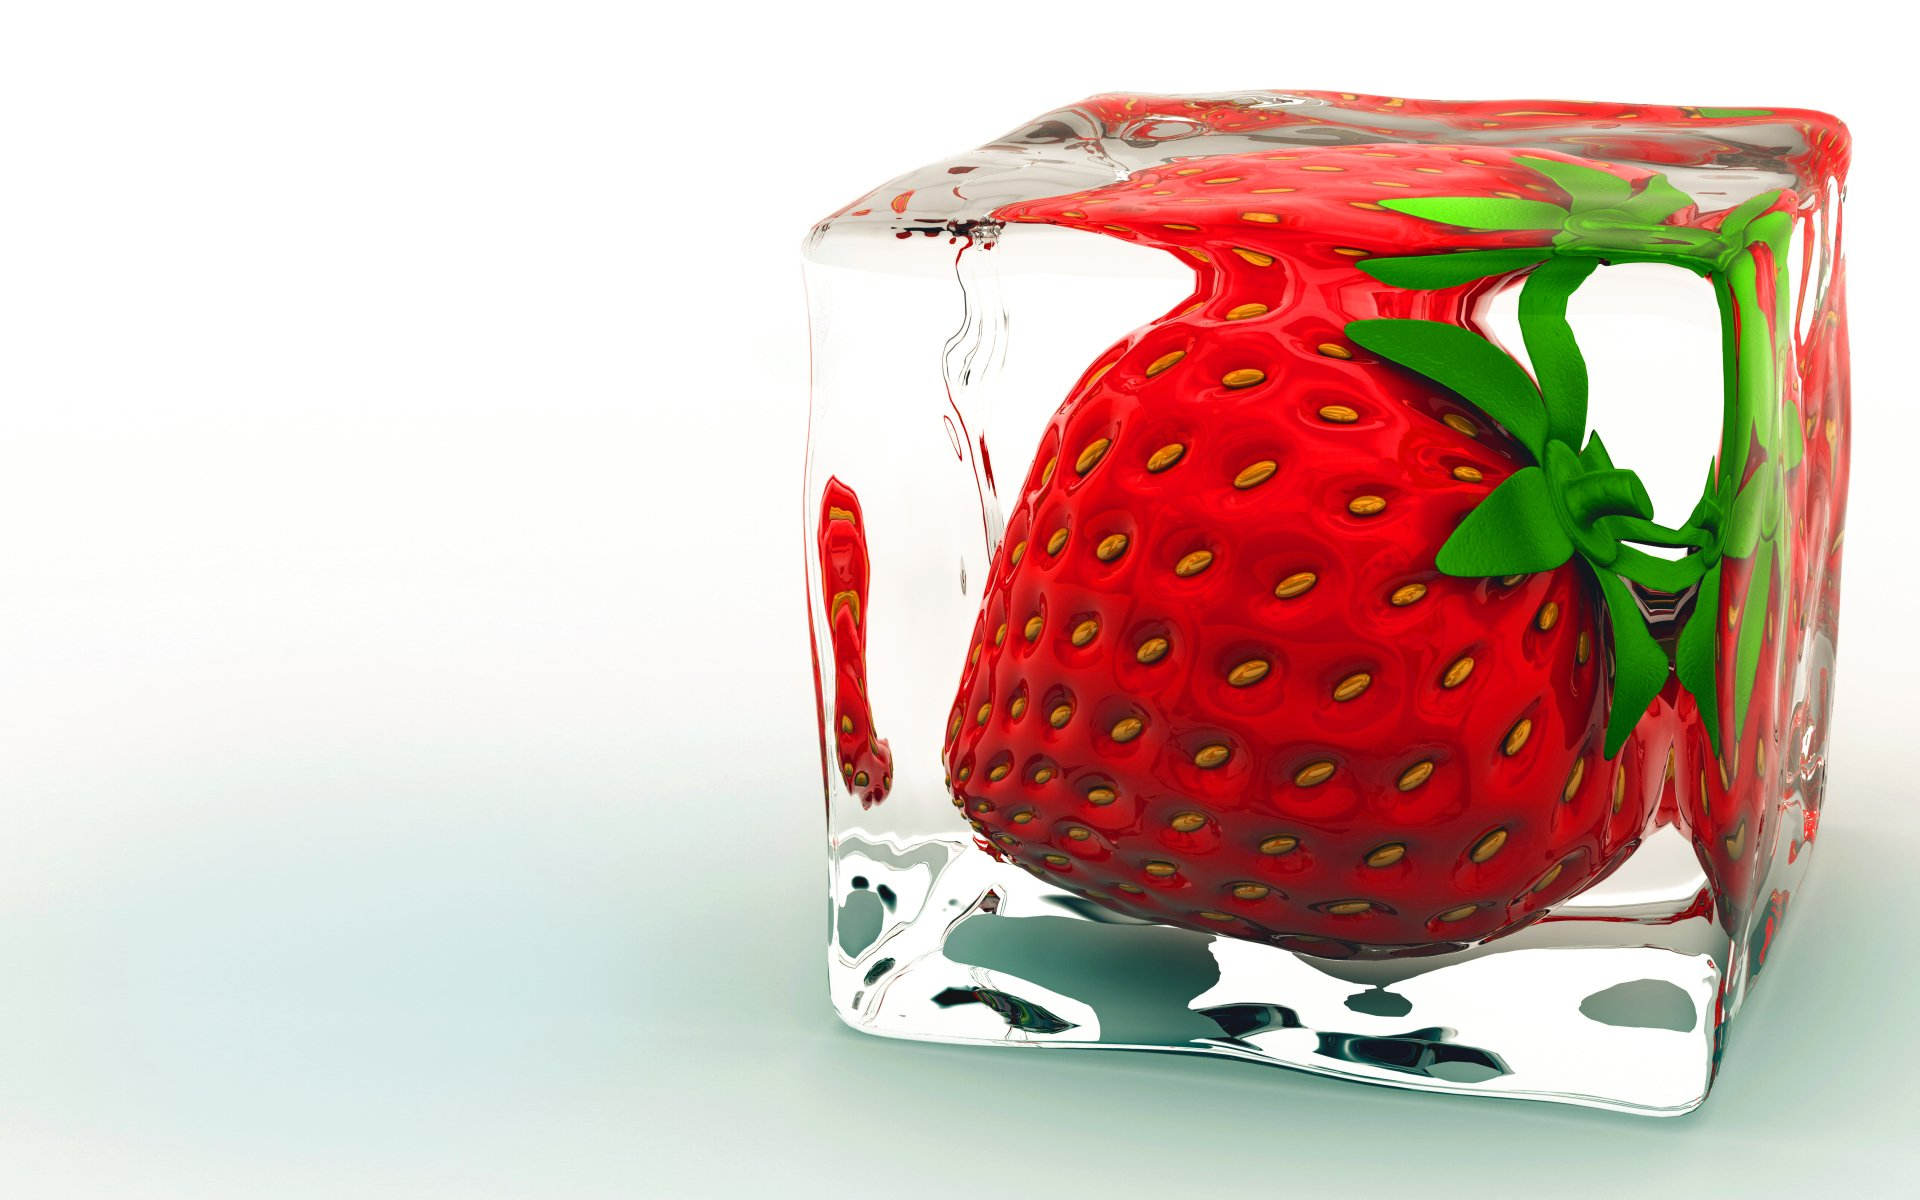 Food - Strawberry  Fruit Nature Wallpaper